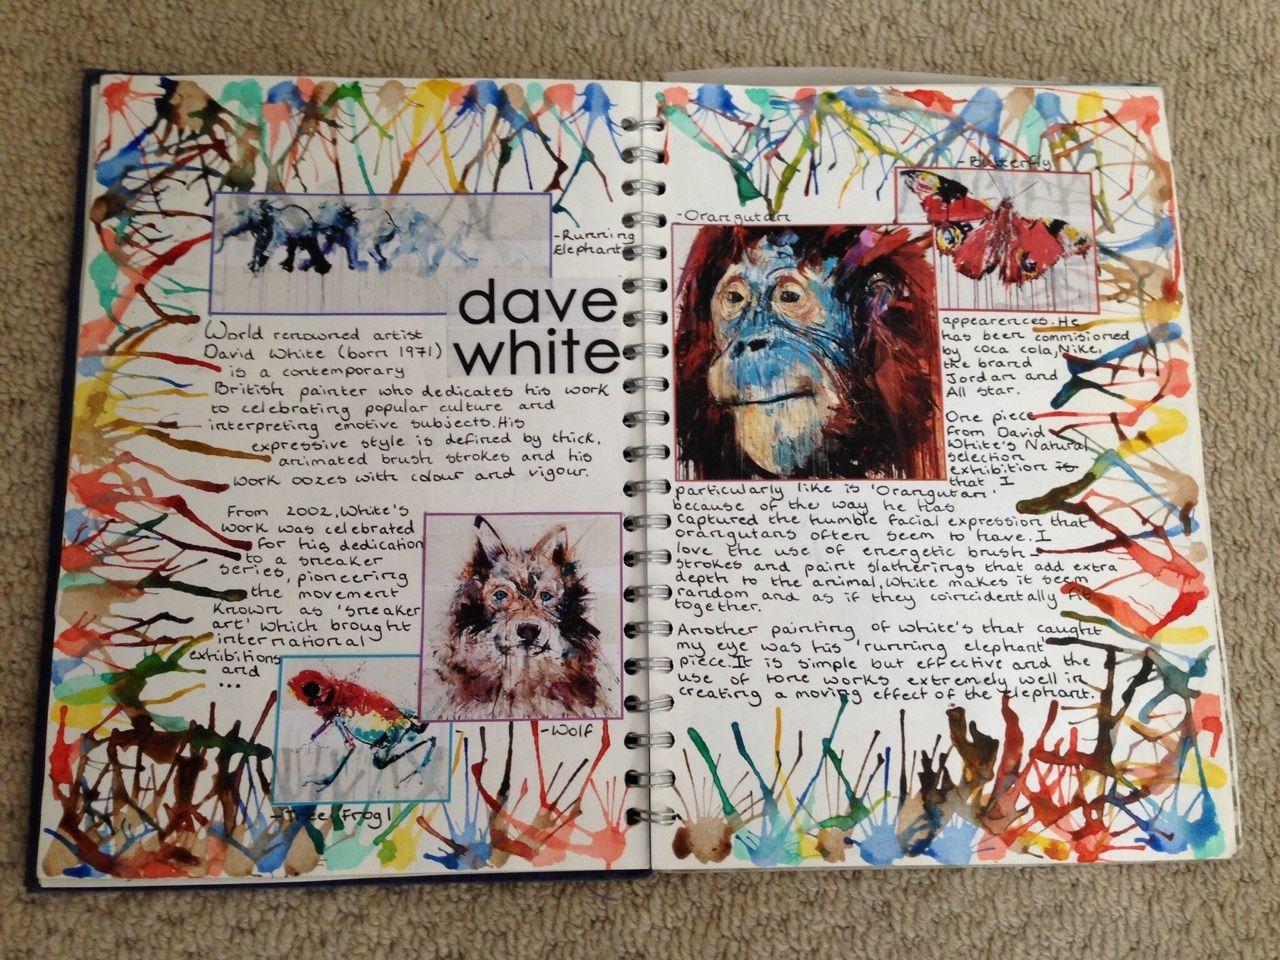 22.10.14 Gcse David White Artist Page